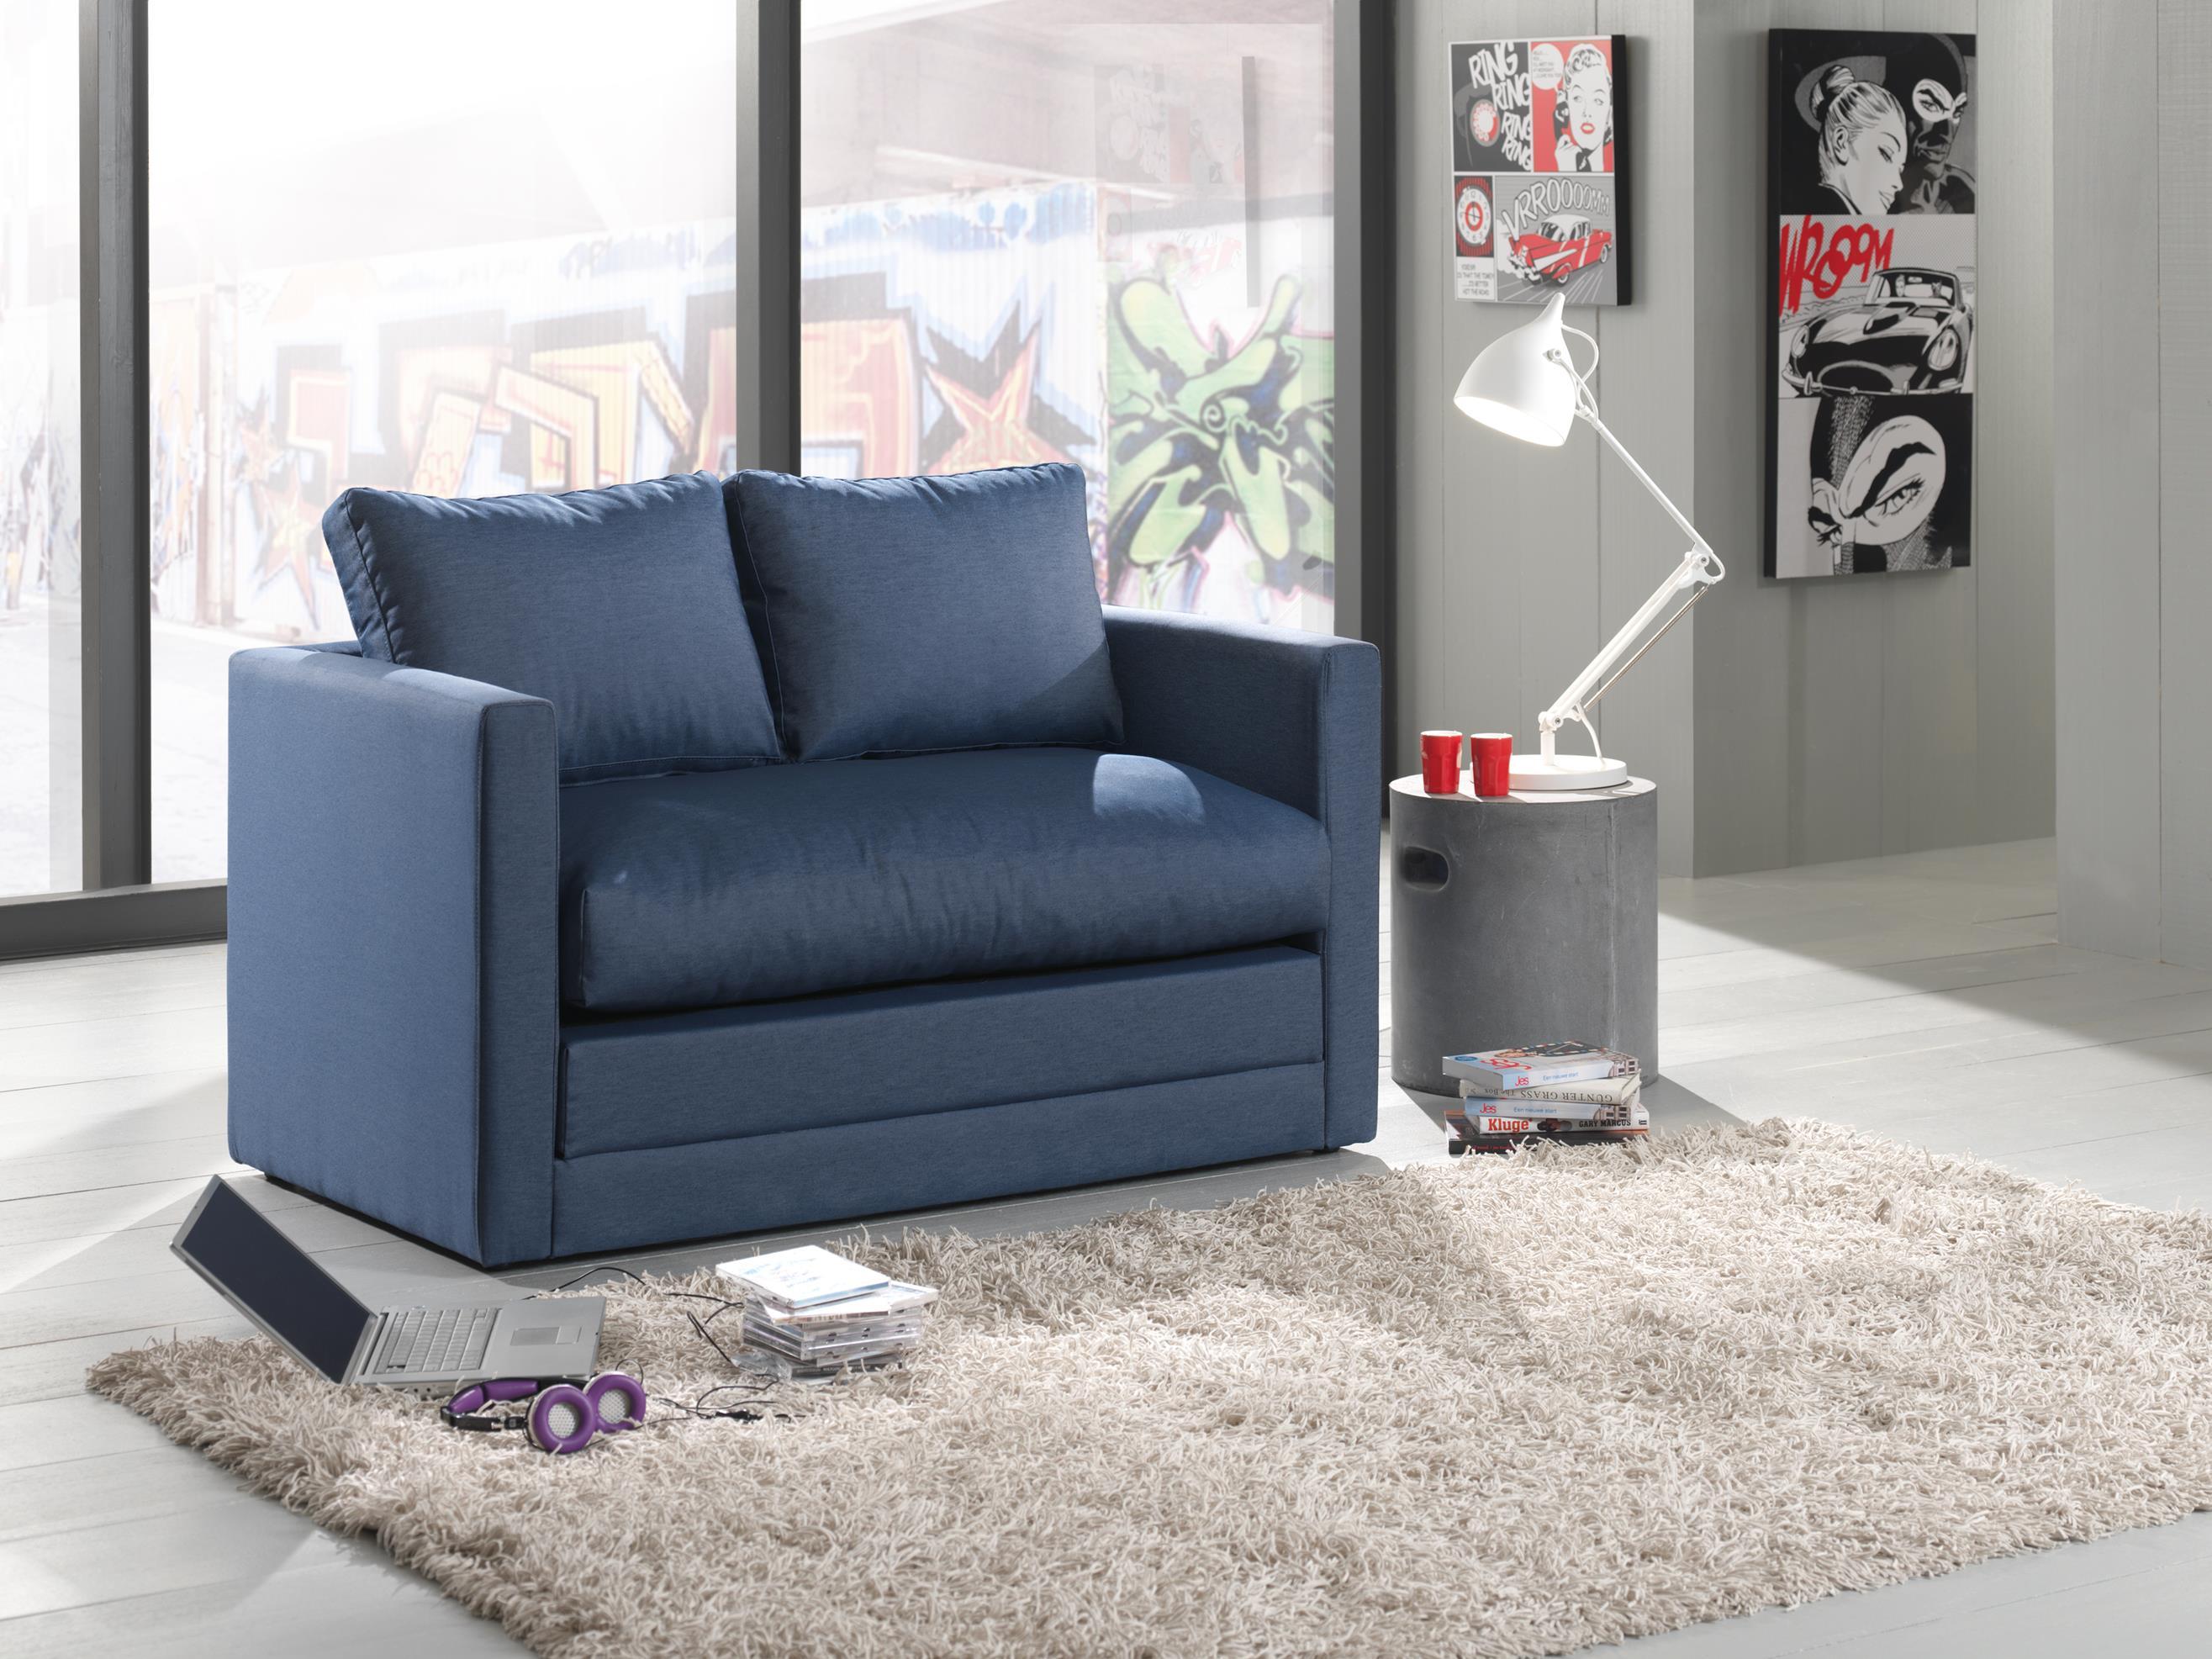 Sofa cama 2 plazas muebles bandama for Sofa cama 2 plazas precios